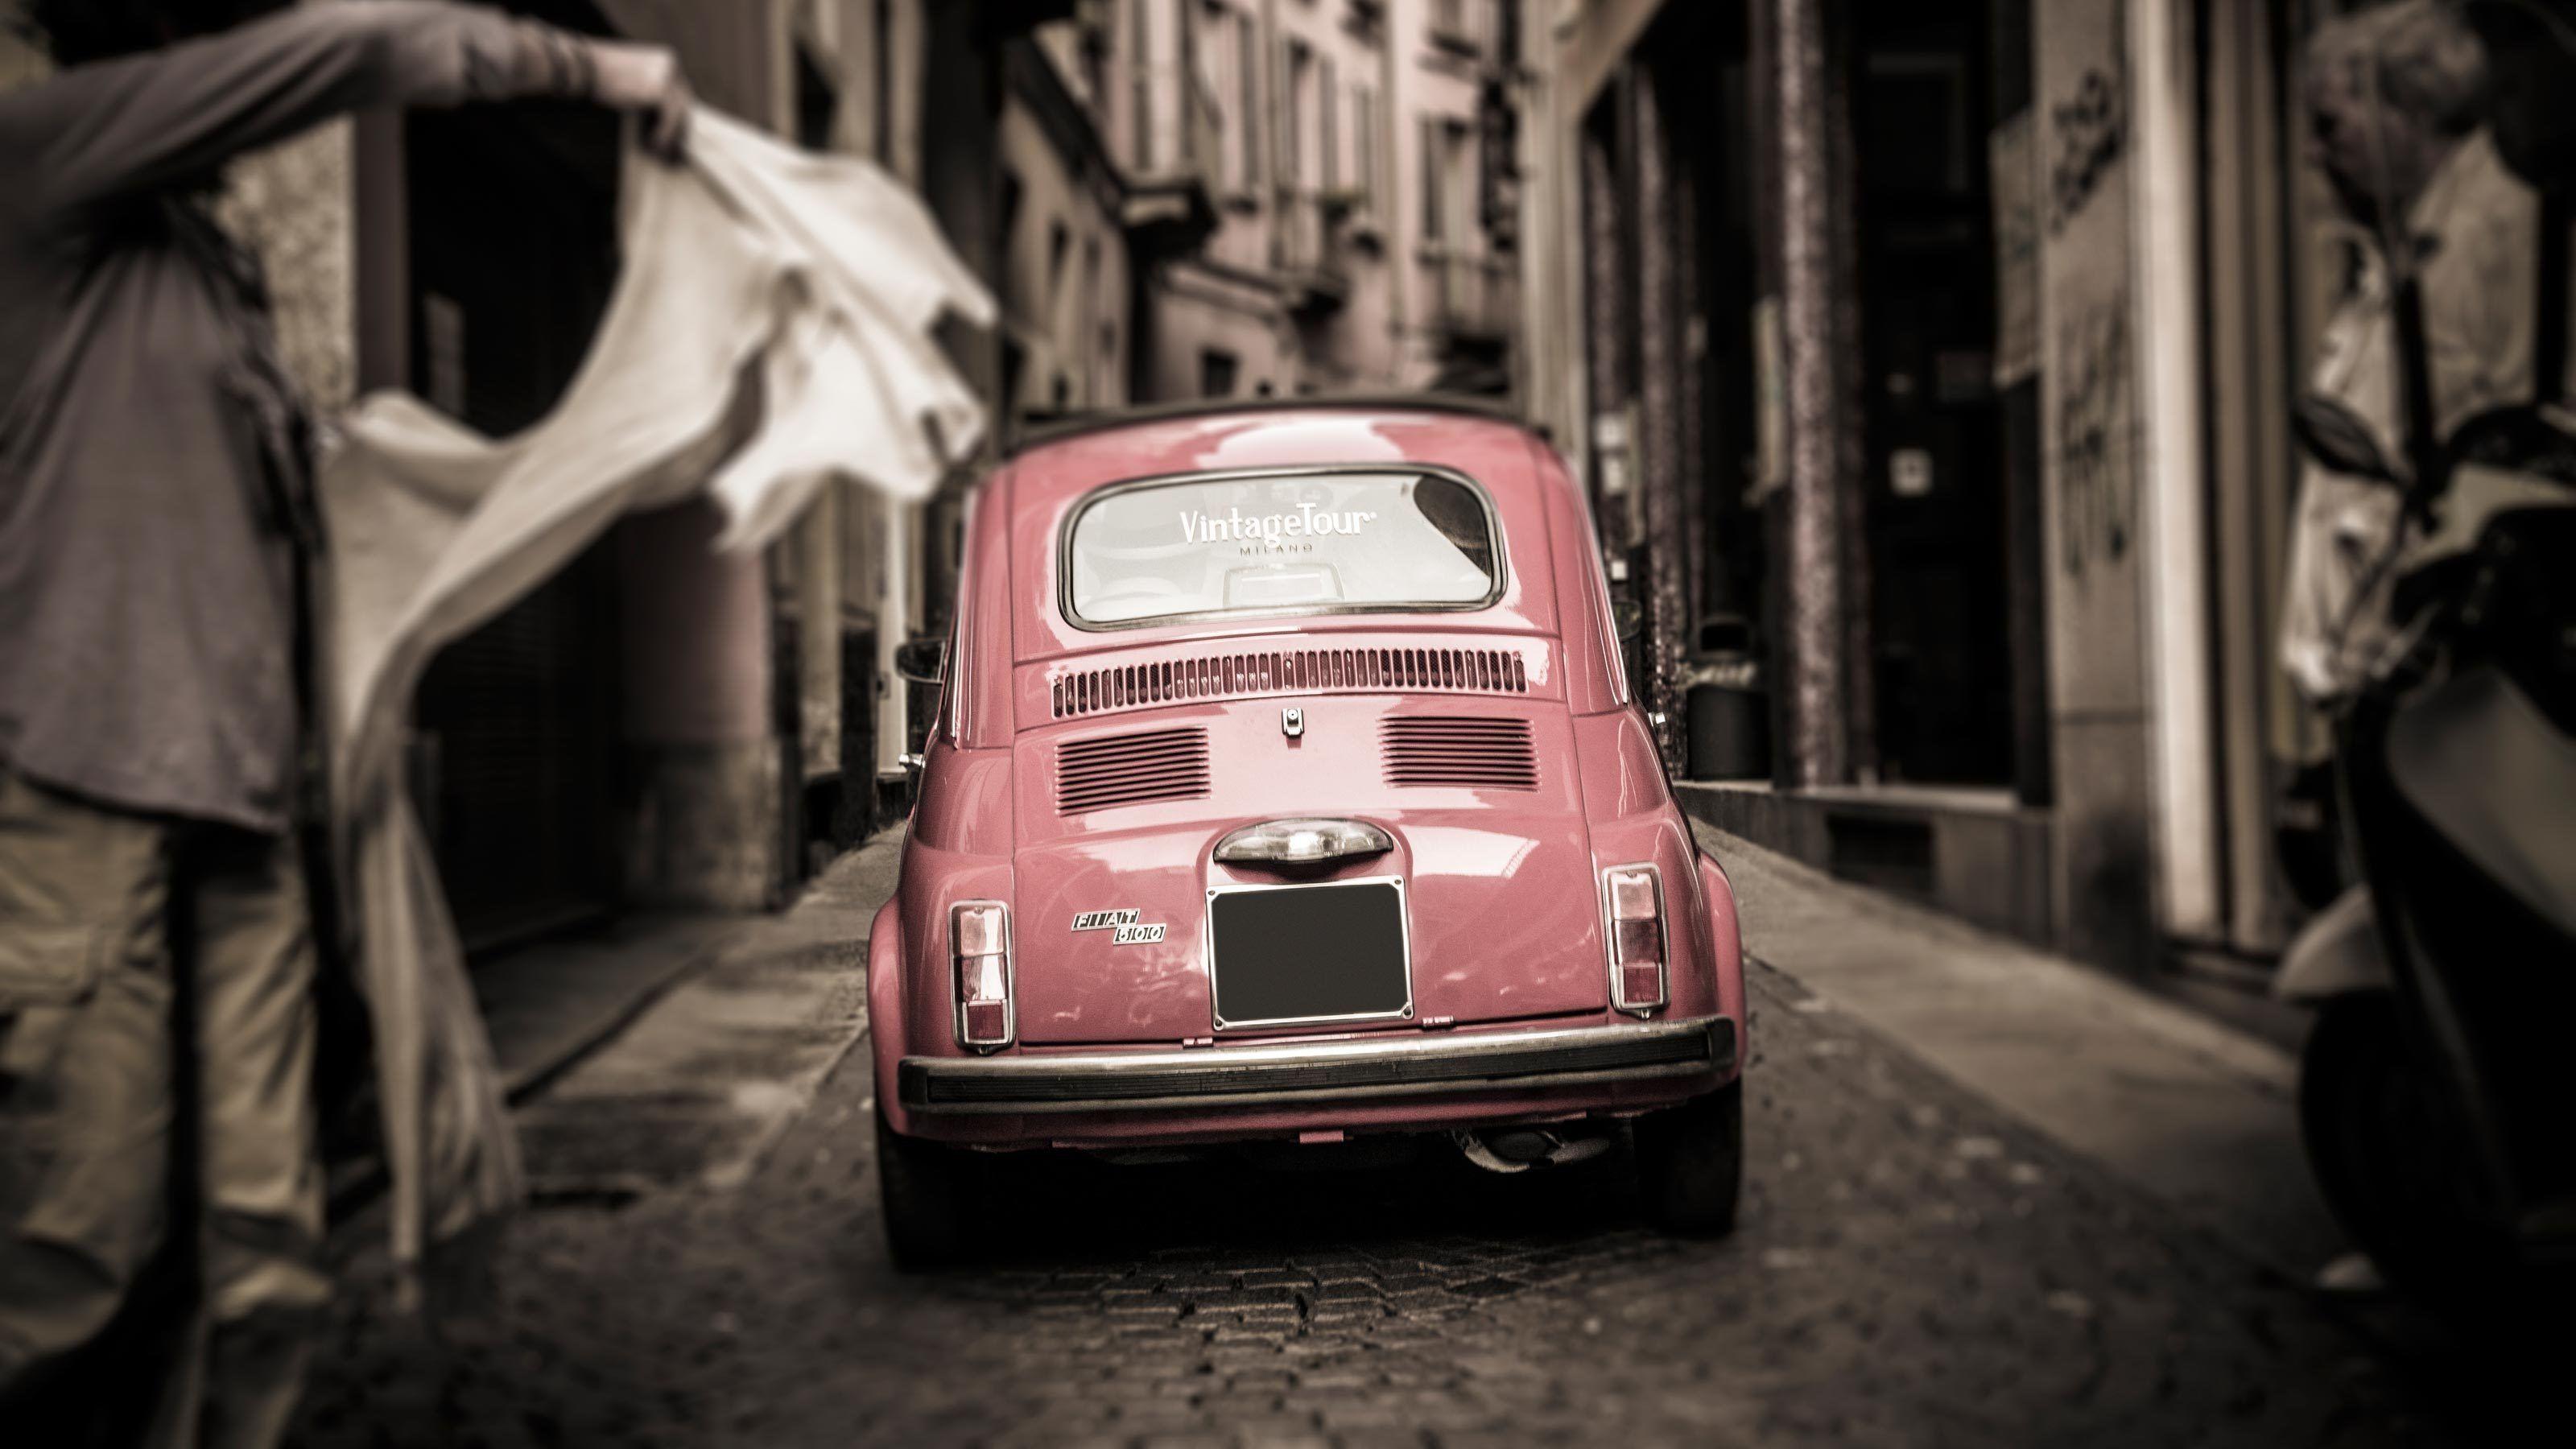 driving a Fiat car through a narrow street in Italy